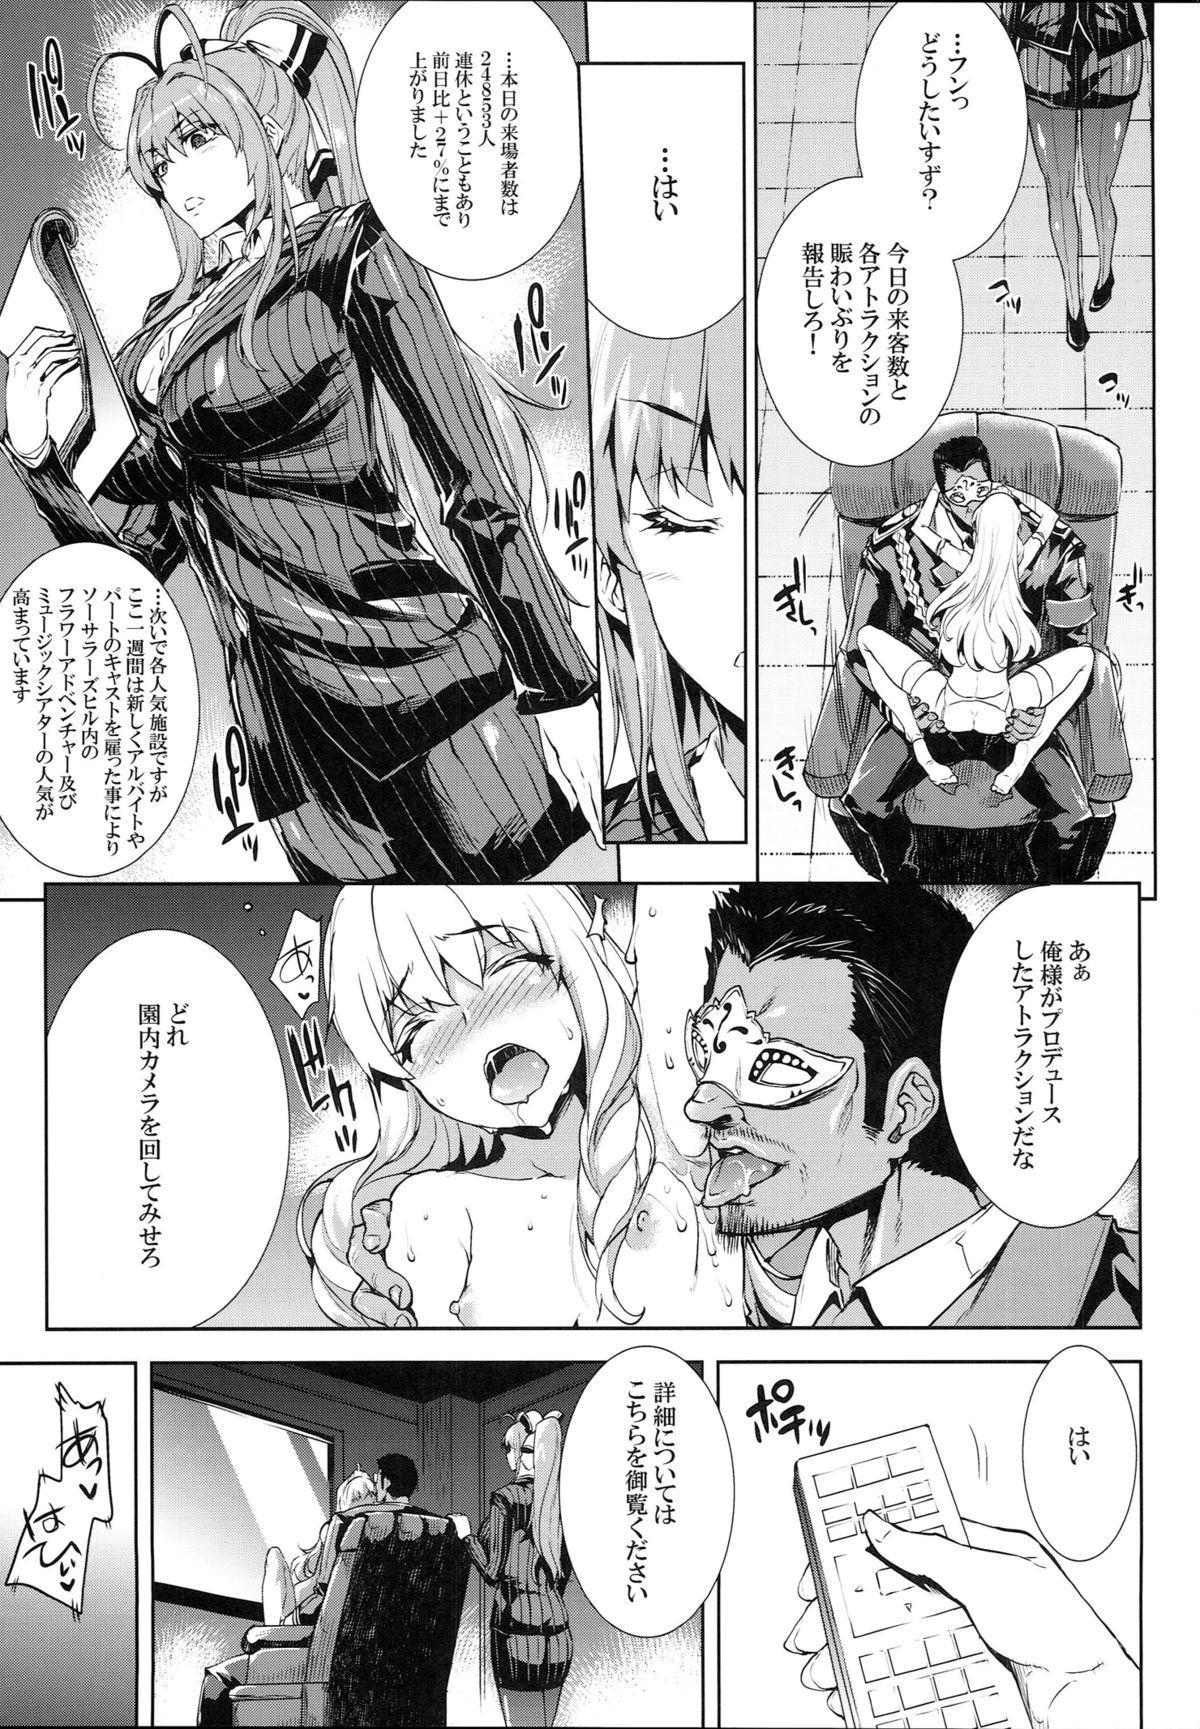 Amagi Erect Sawaru parade 5